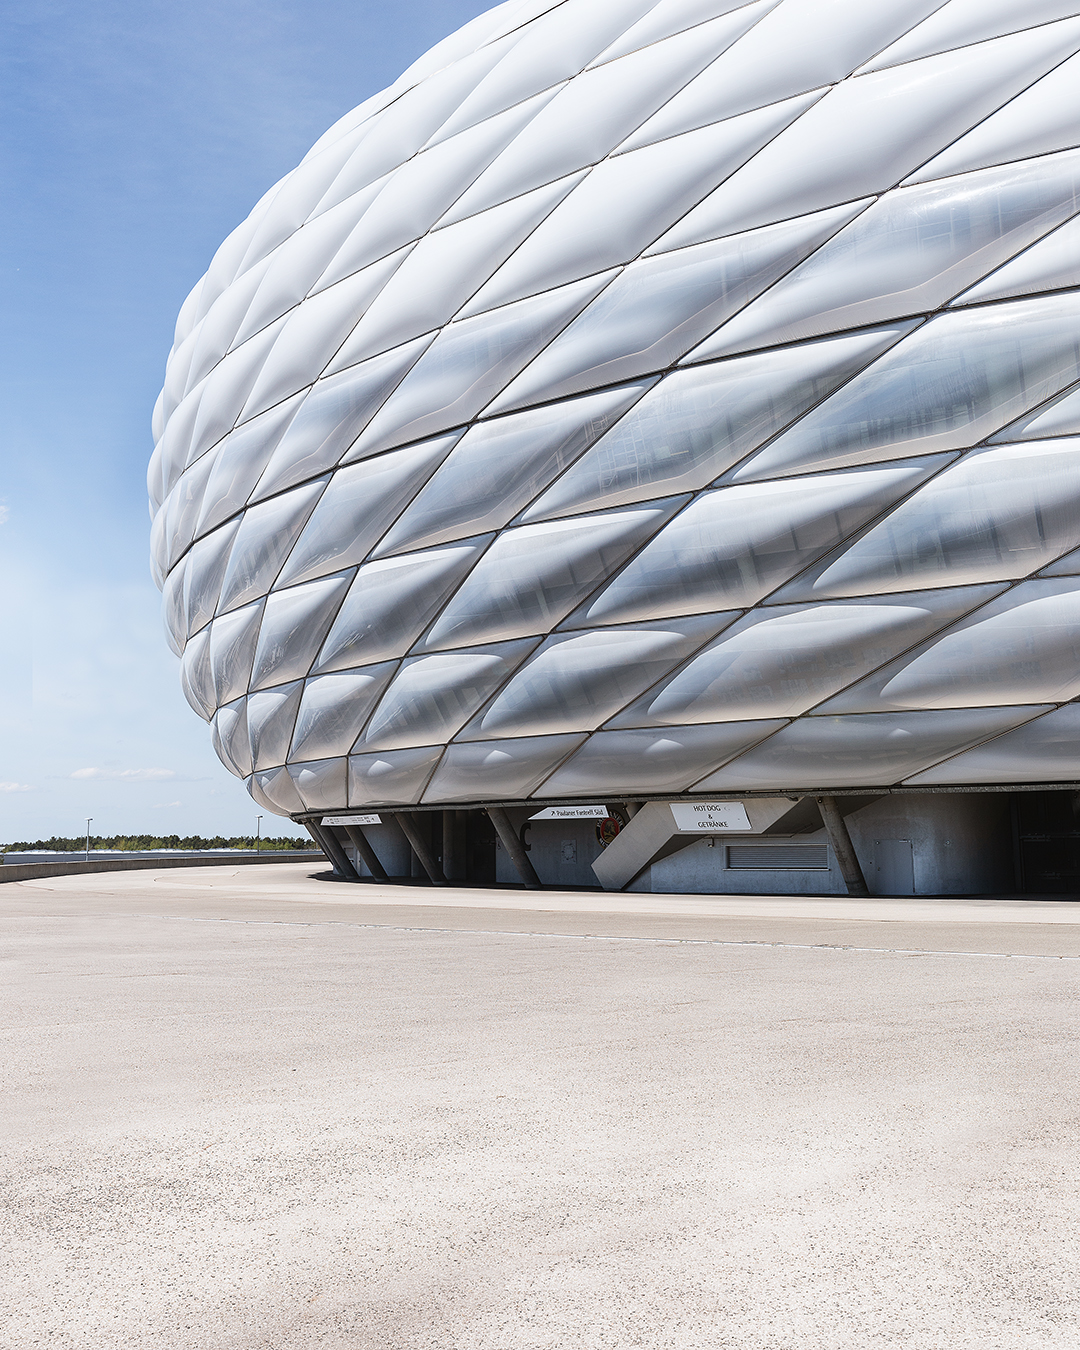 Bowl of Munich- Allianz Arena, Germany